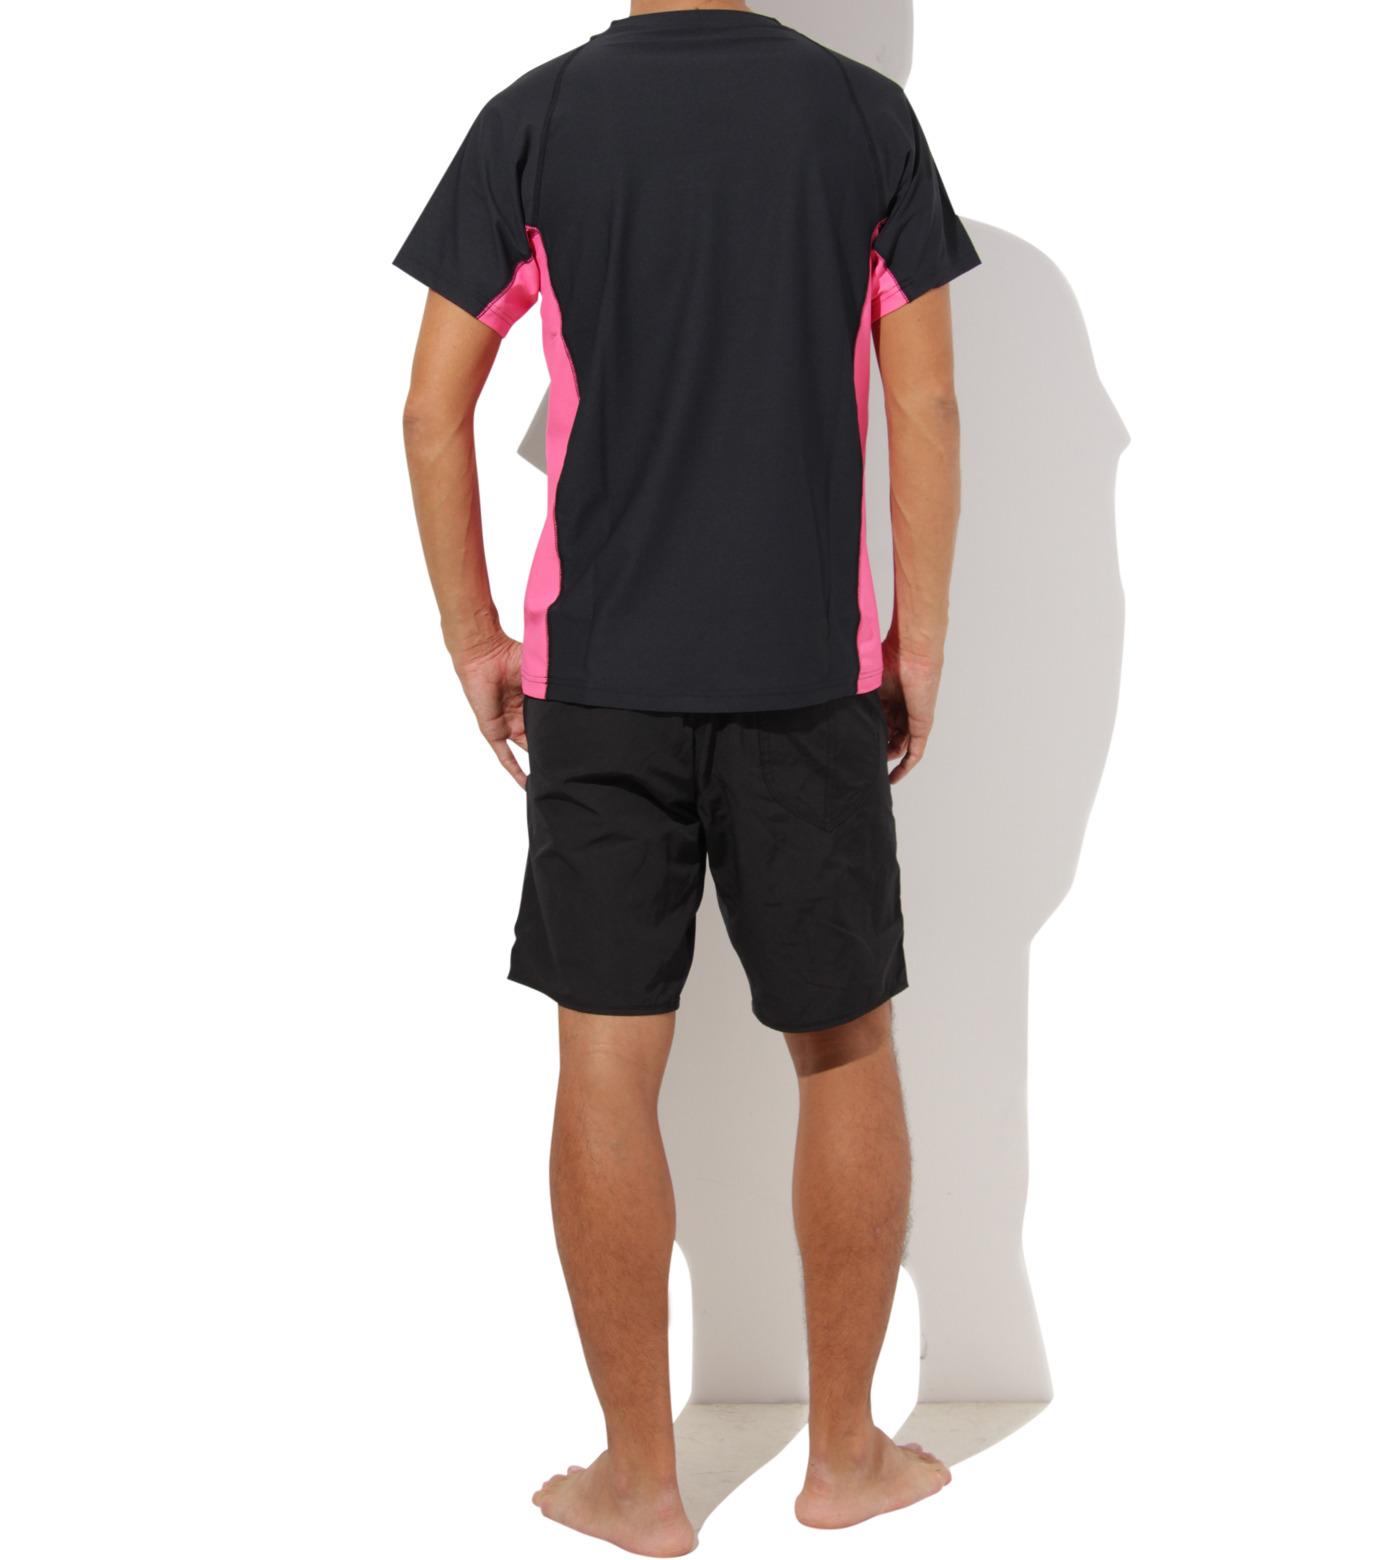 TWO TWO ONE(トゥートゥーワン)のSurf shorts short-BLACK(SWIMWEAR/SWIMWEAR)-15N948001-13 拡大詳細画像6